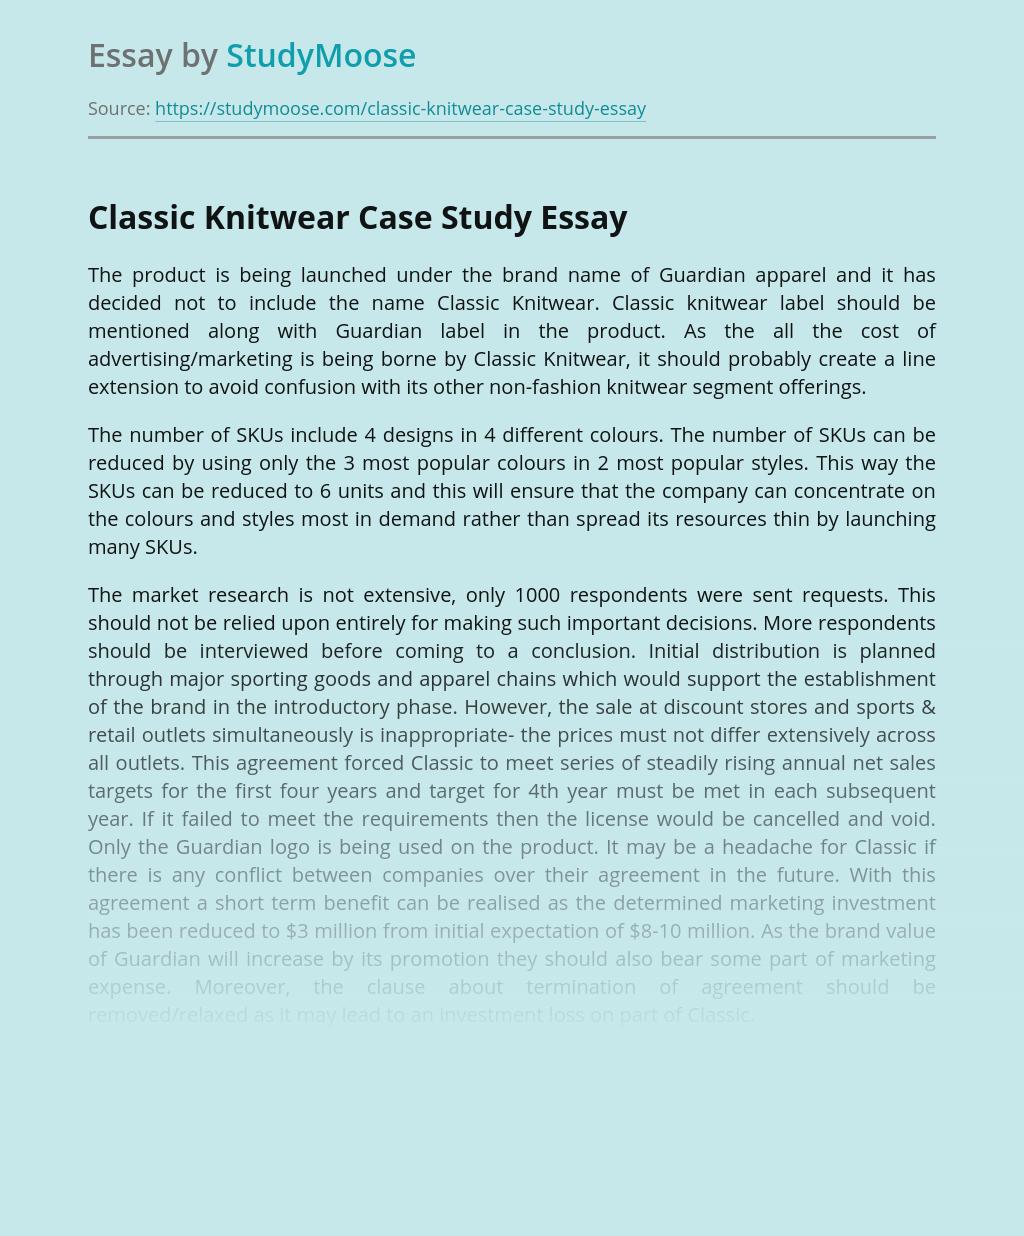 Classic Knitwear Case Study